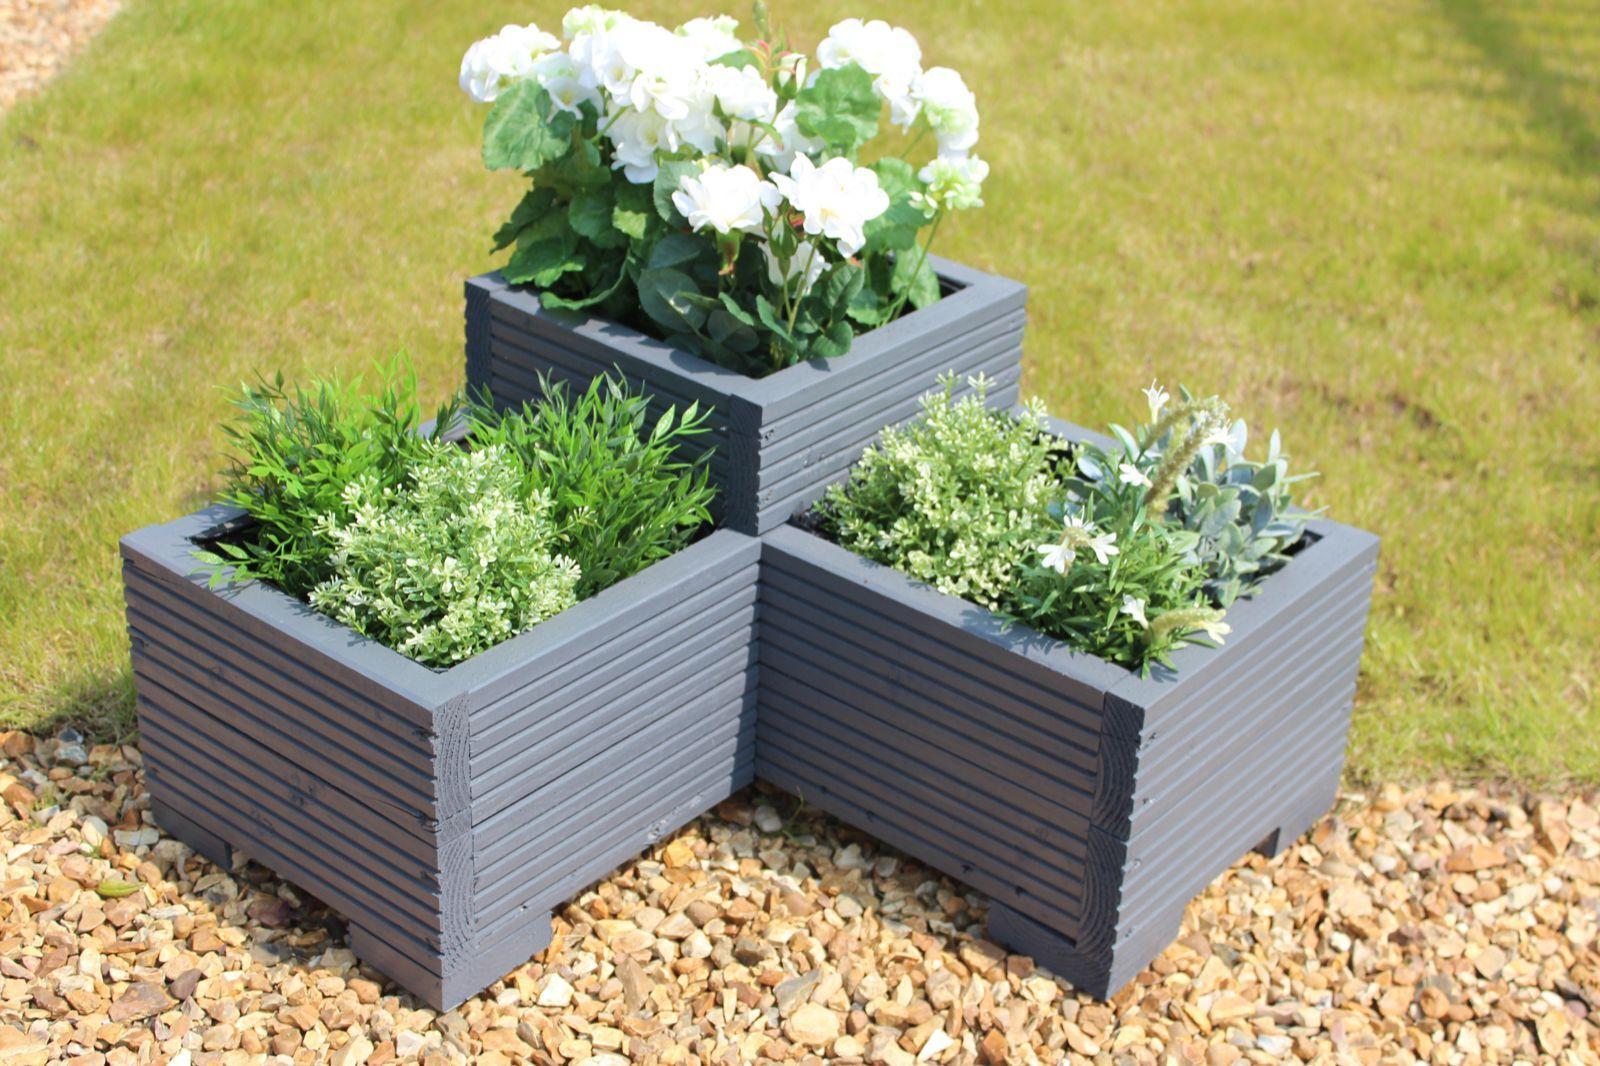 Grey 3 Tier Corner Planter Painted Wooden Garden Troughs or Plant Pots